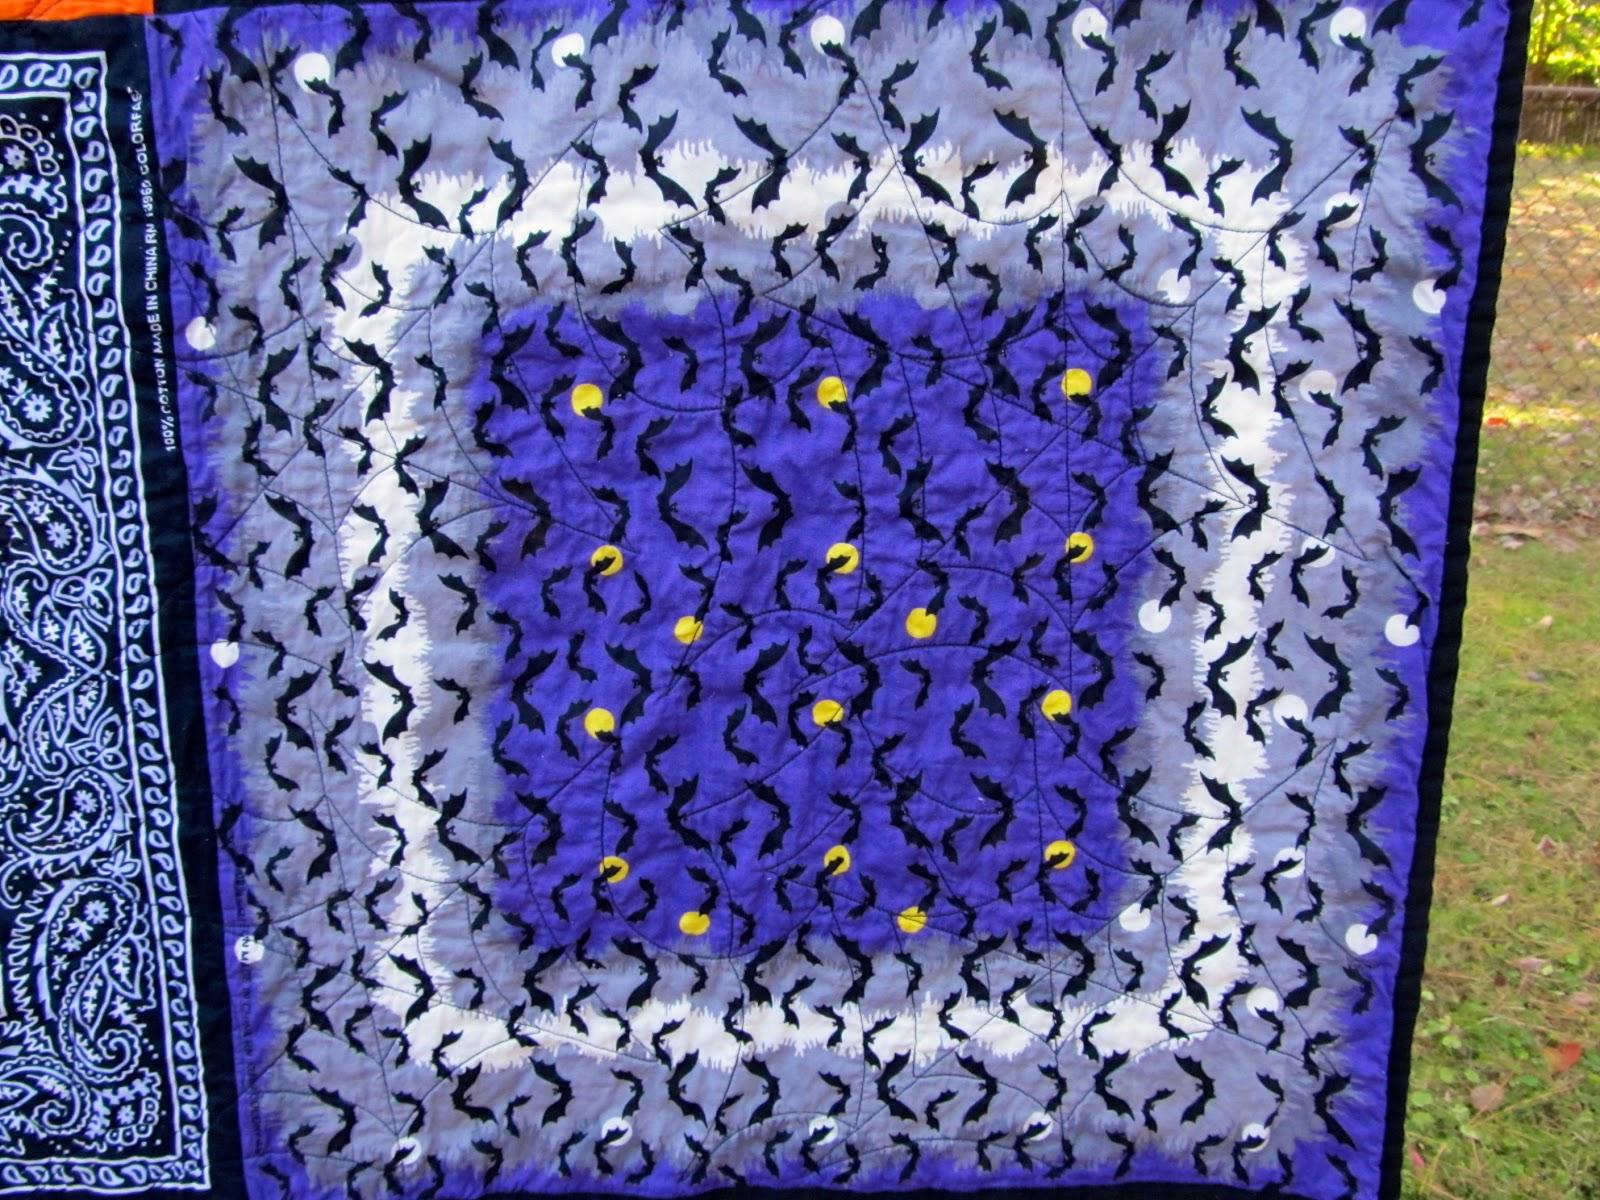 Blue Bandana Wallpaper   HD Wallpapers Lovely 1600x1200